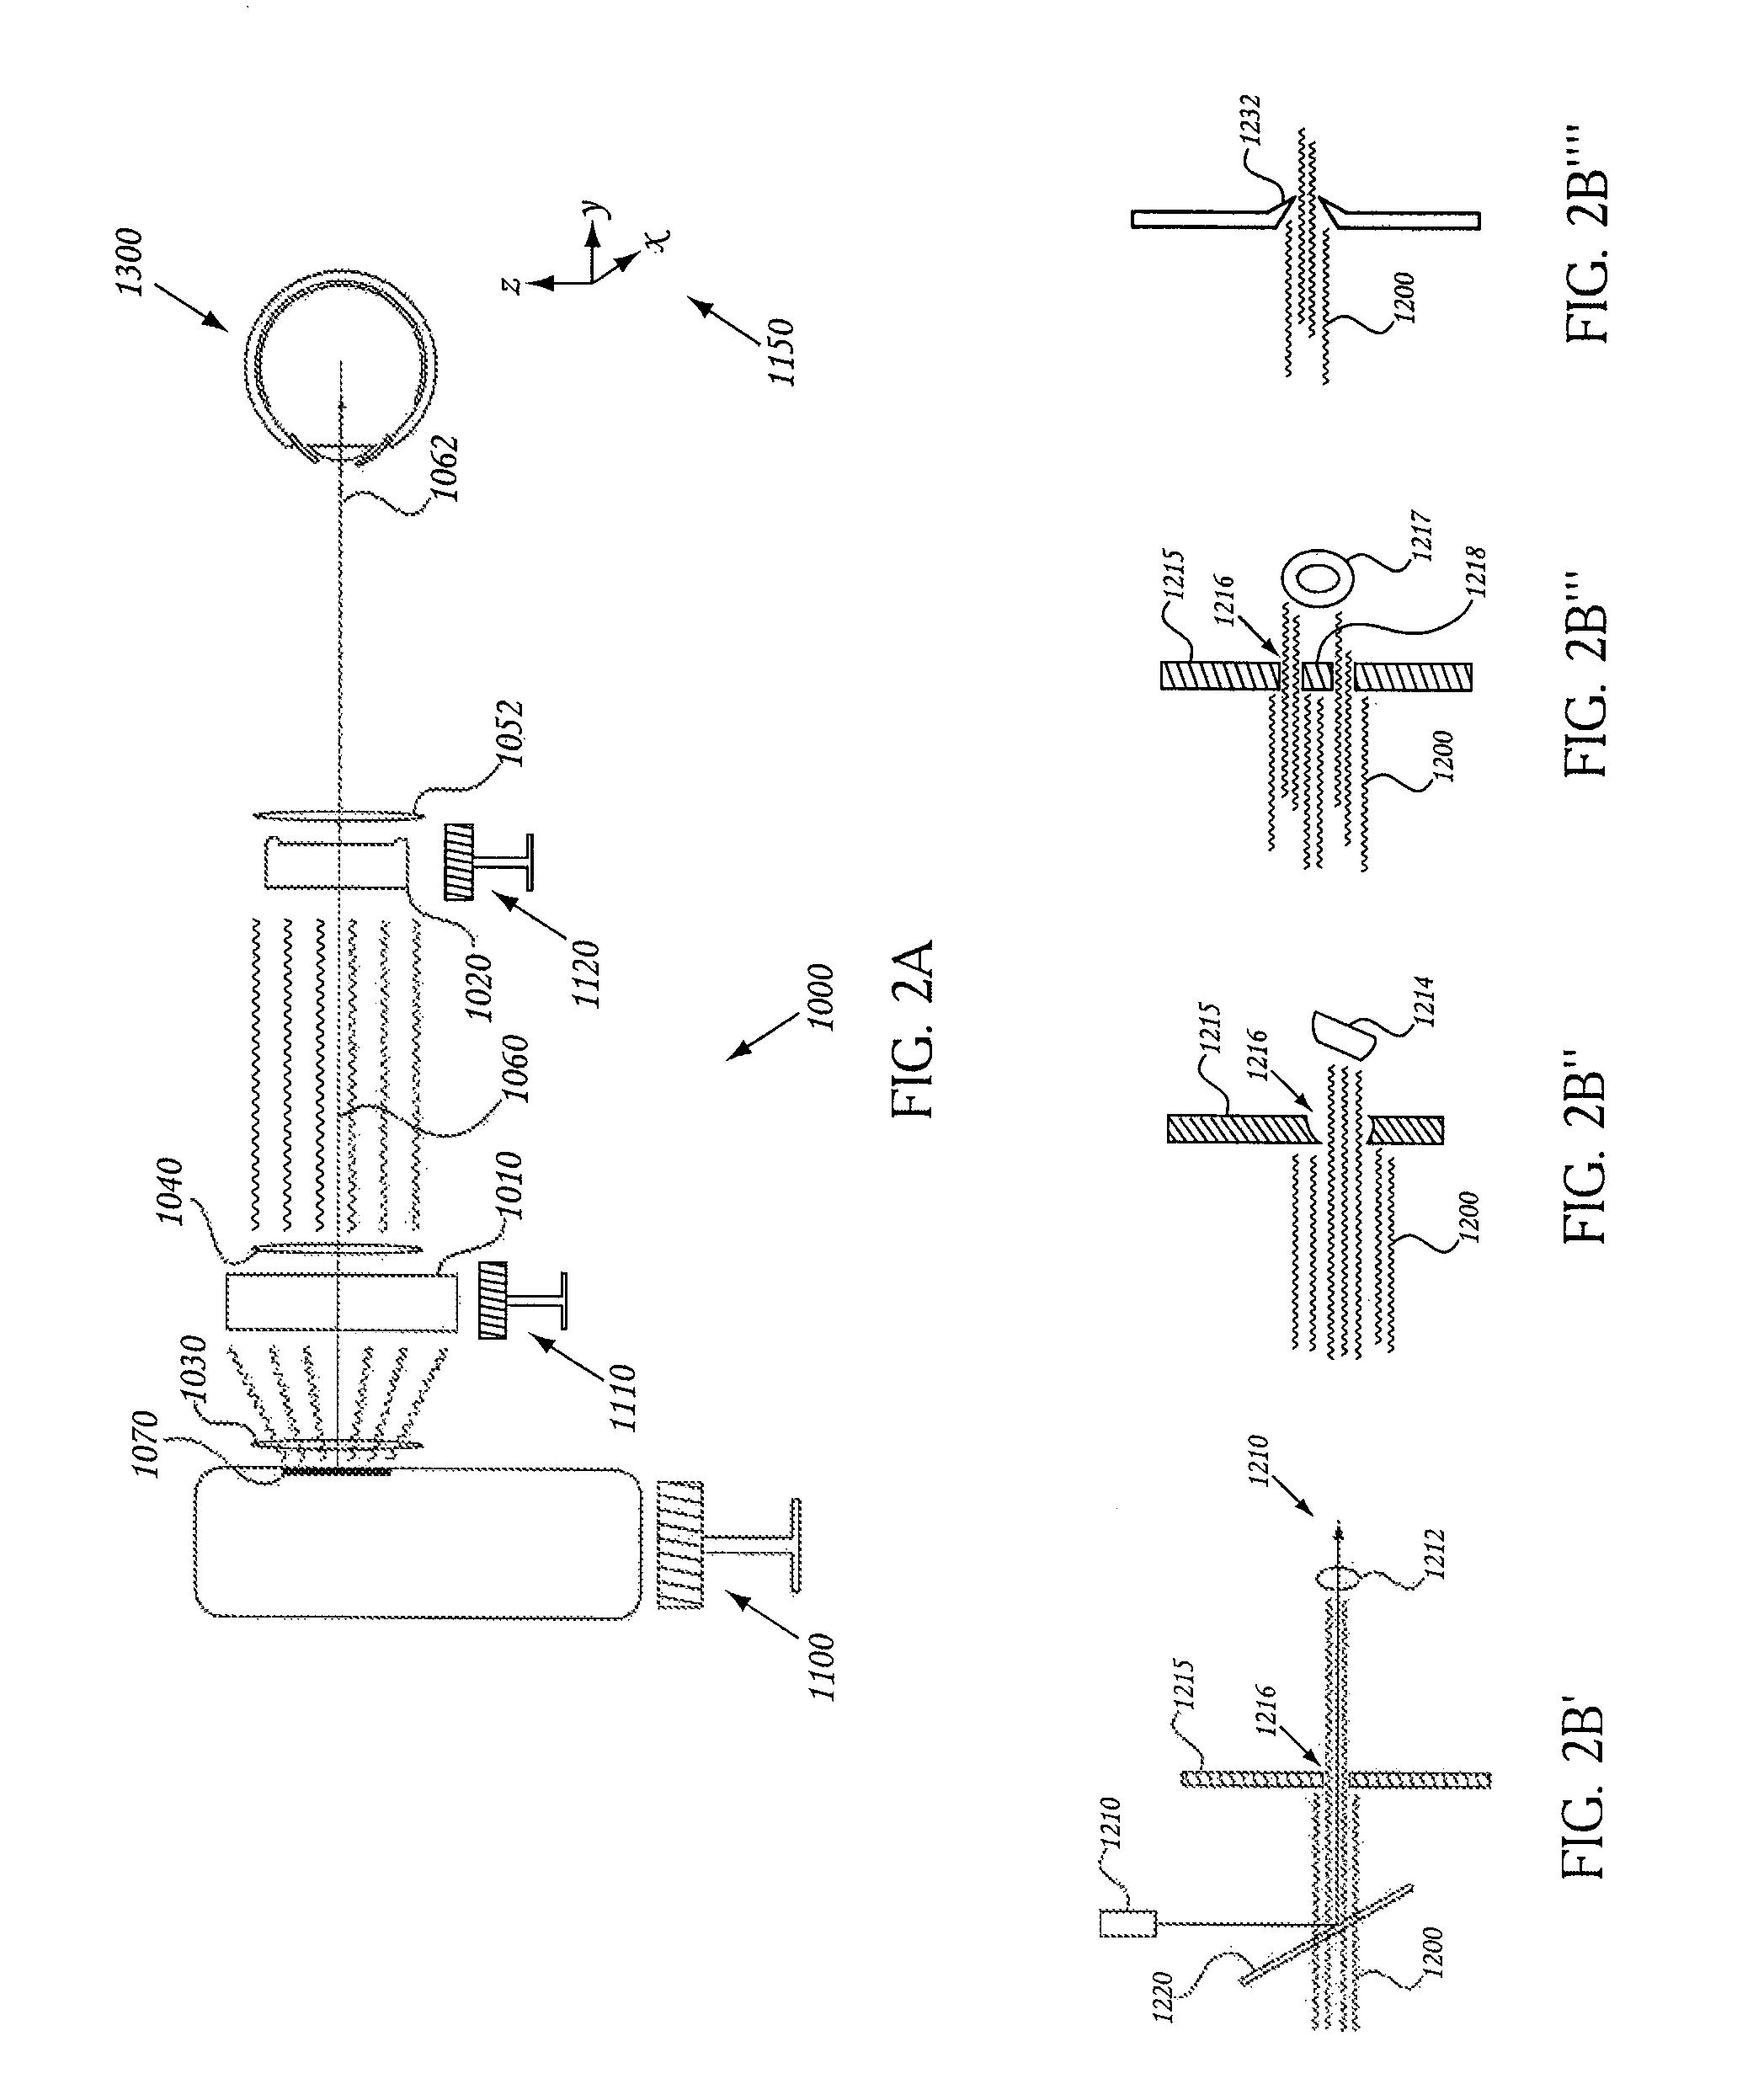 Patent US 8,094,779 B2